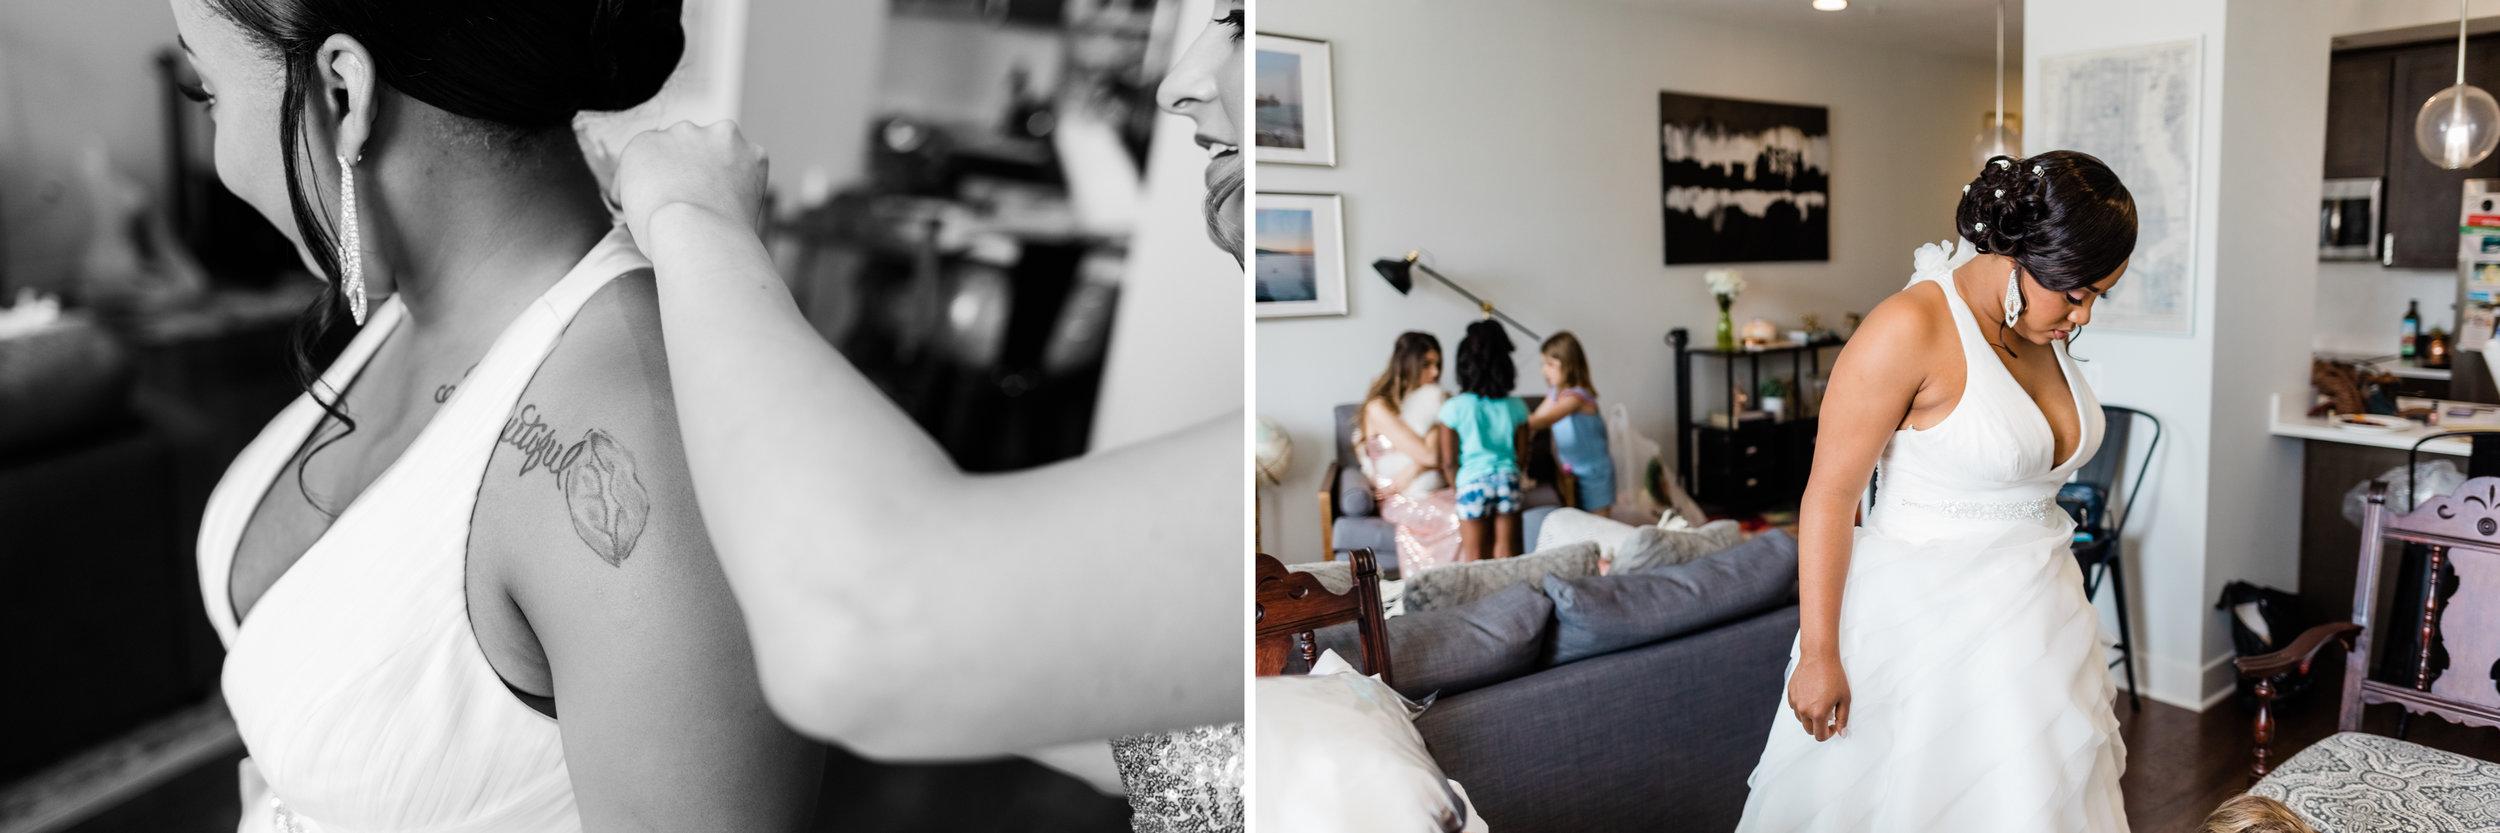 Kansas City Wedding Photographer 56.jpg